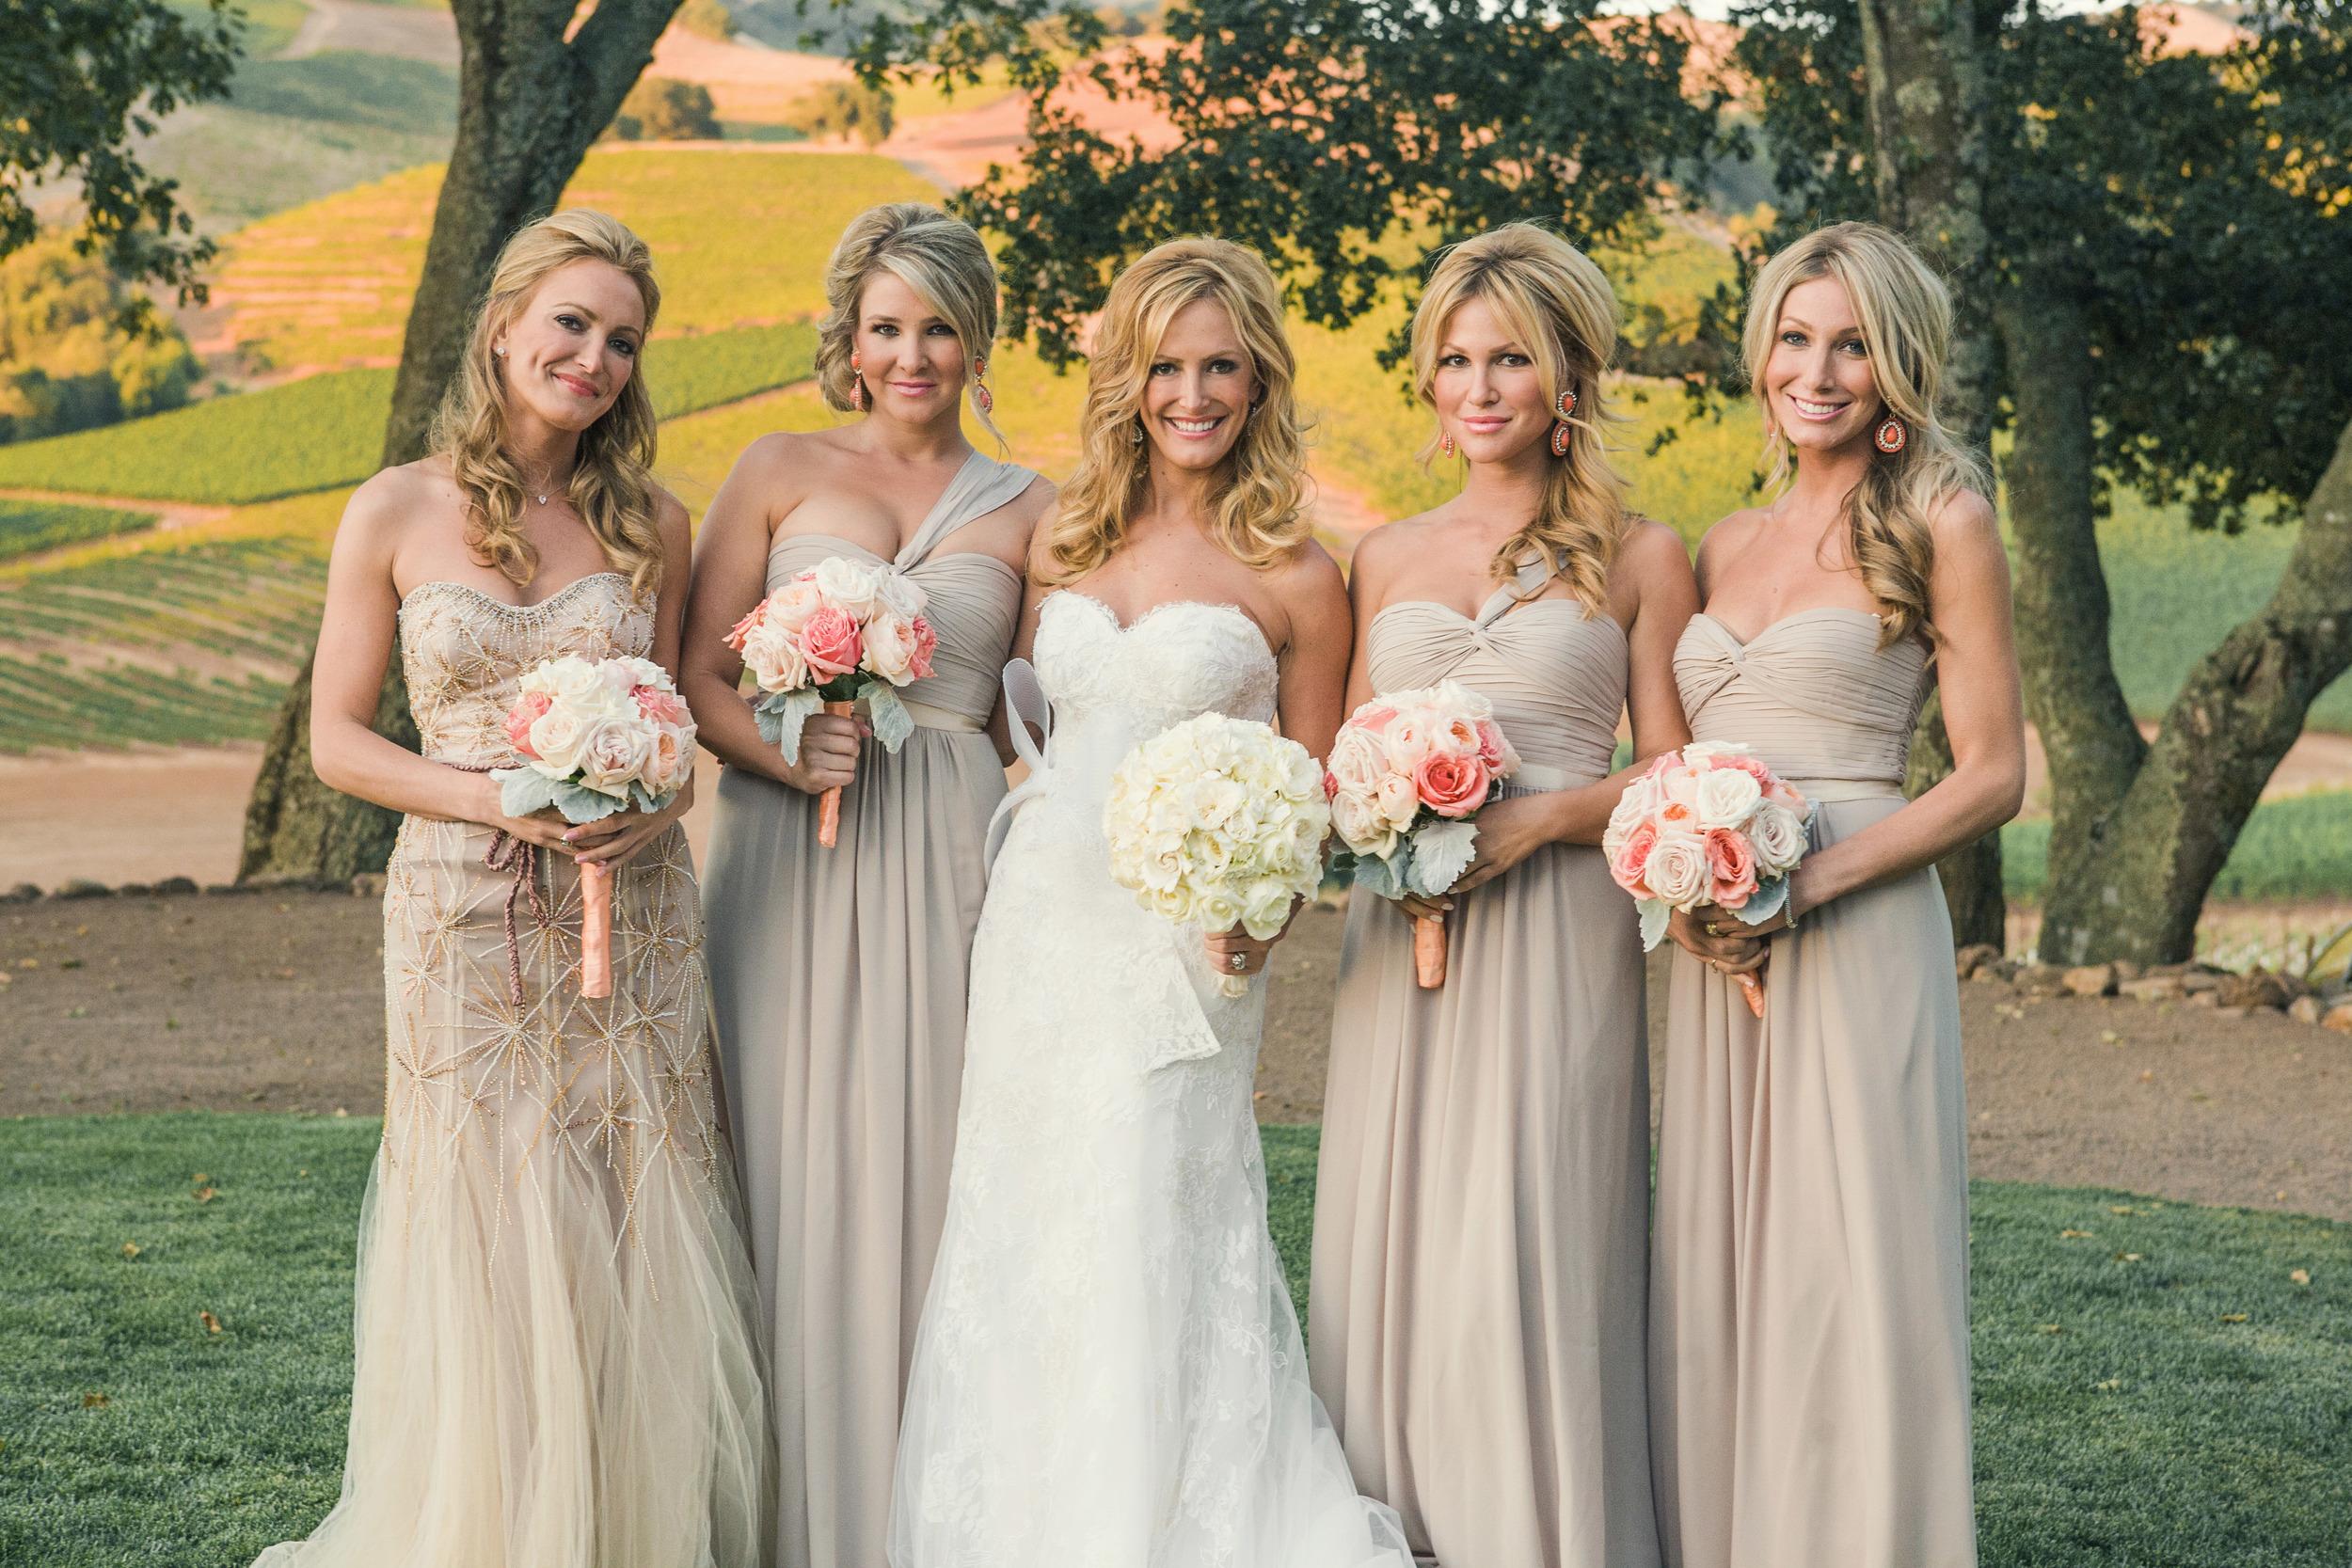 N Bride and bridesmaids sonoma wedding.jpg